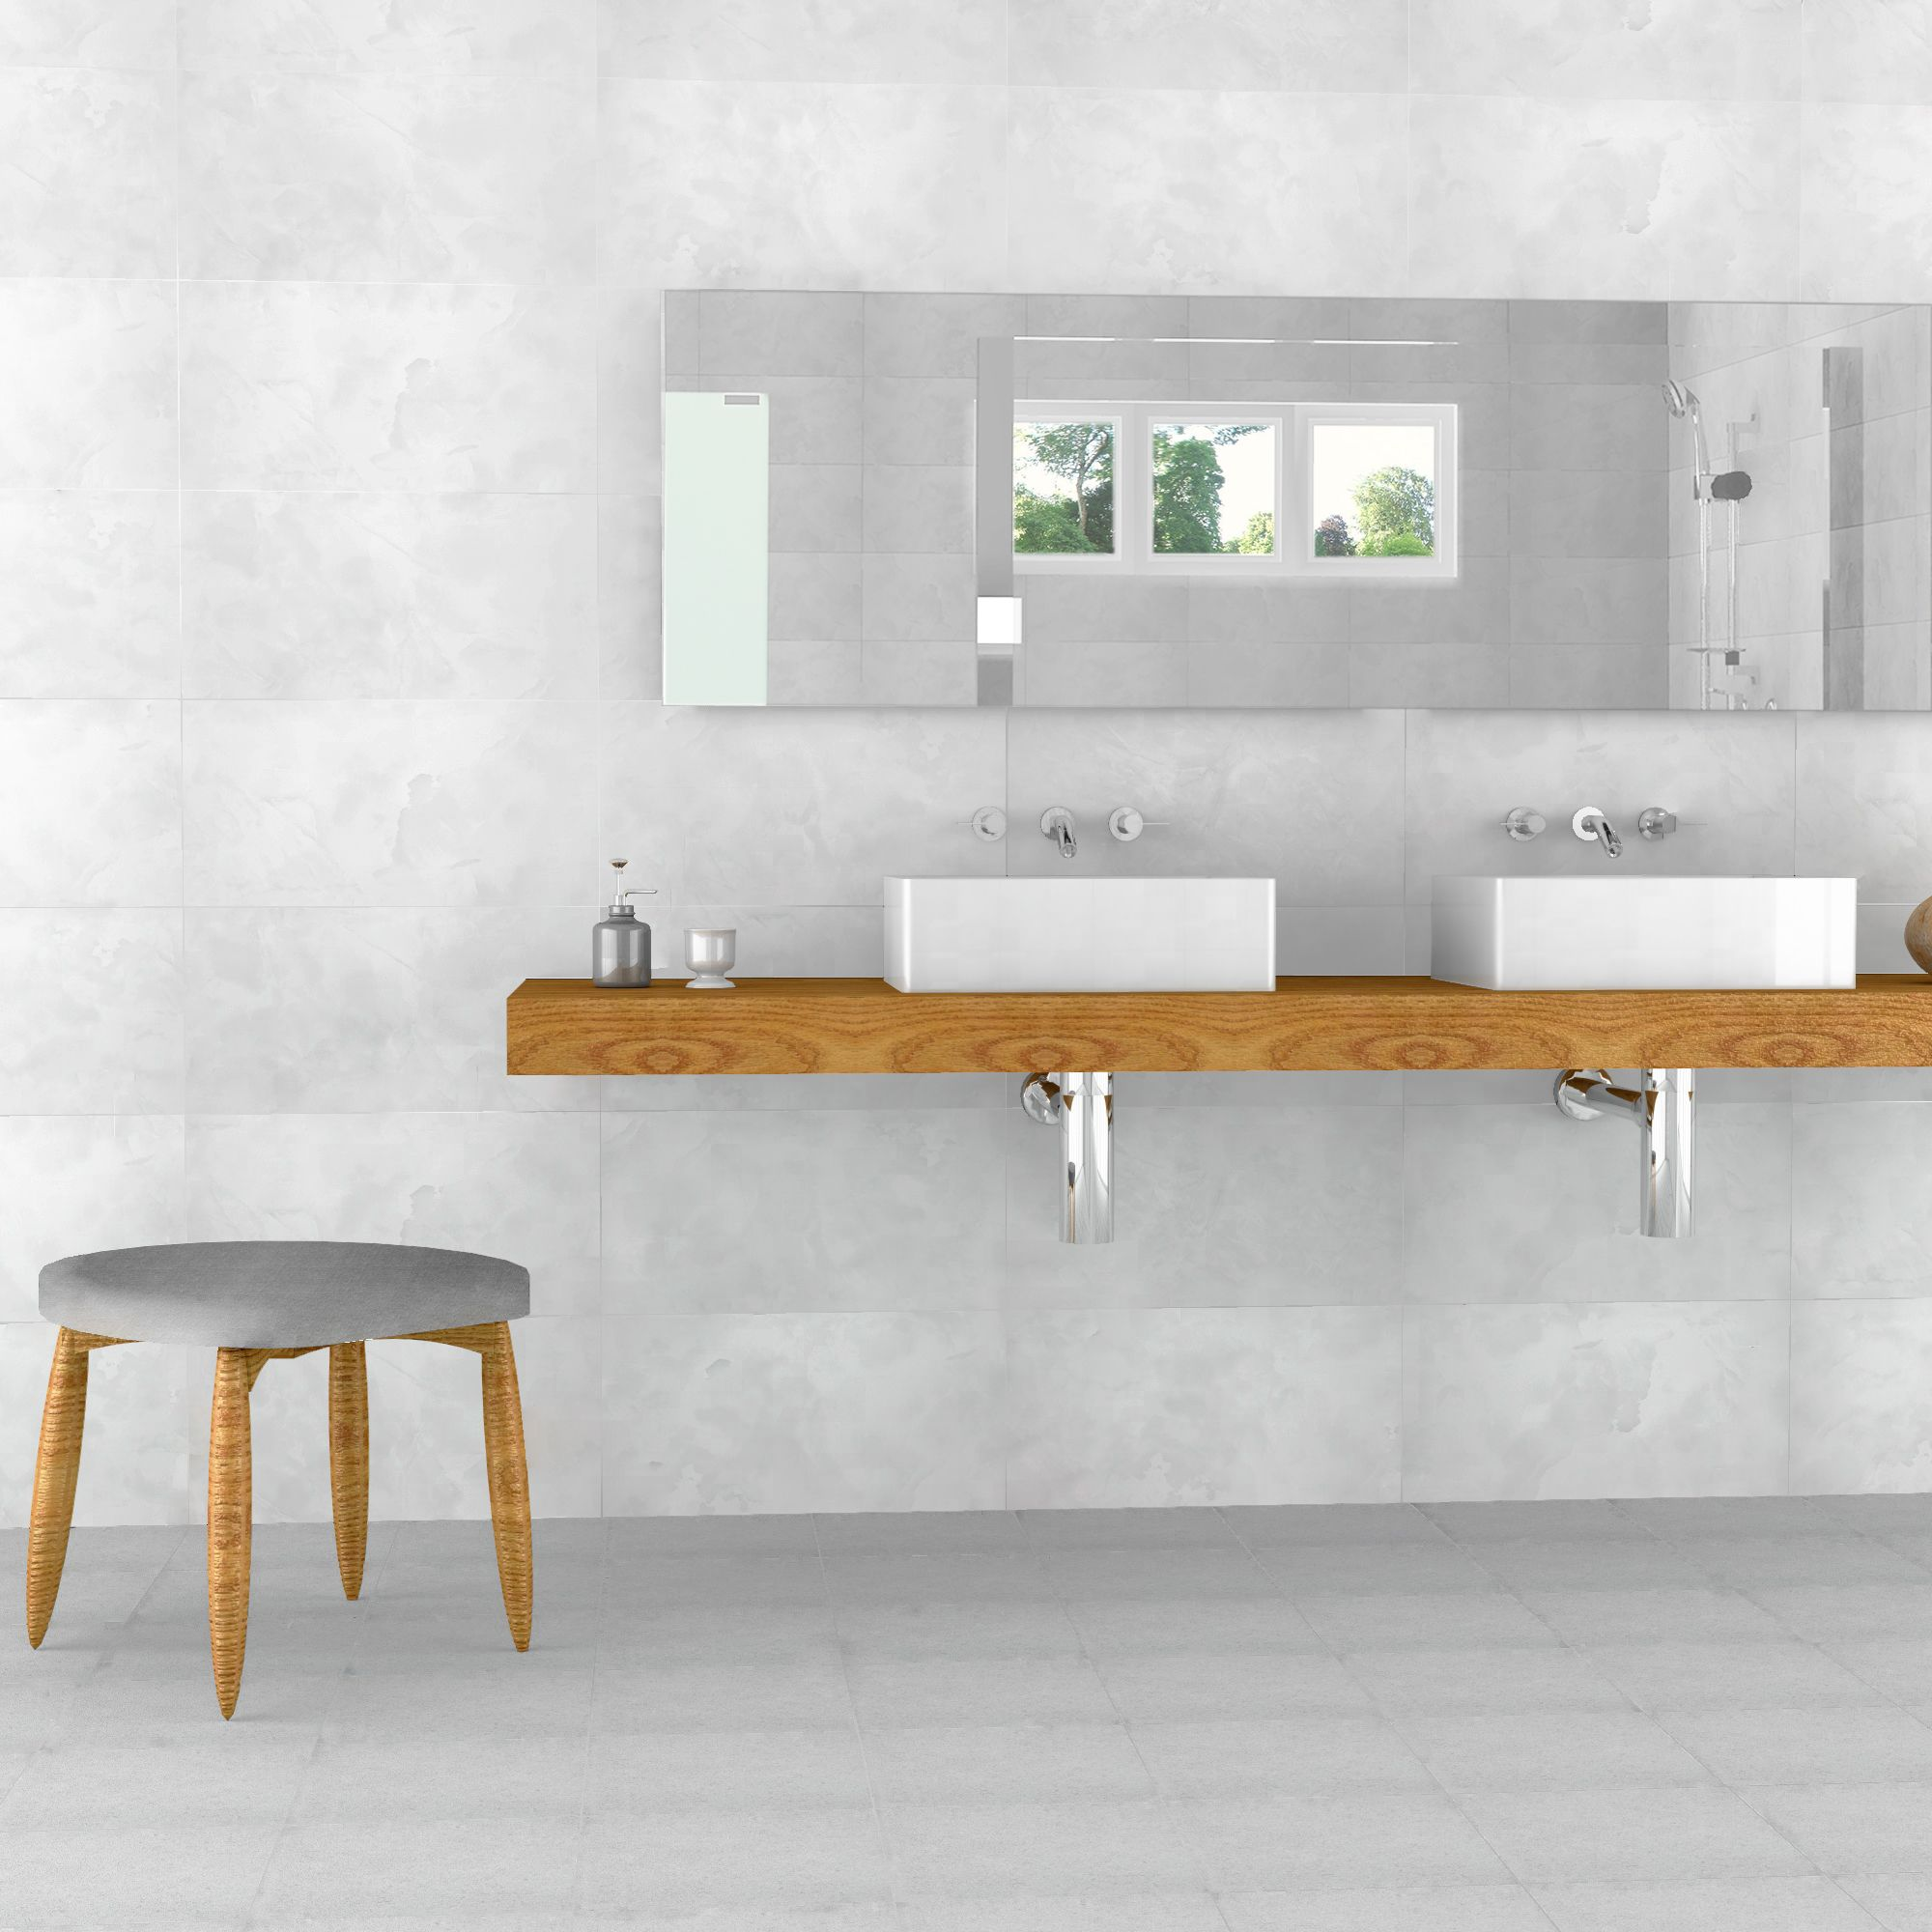 Flair Blanco tiles in 30x60 cm